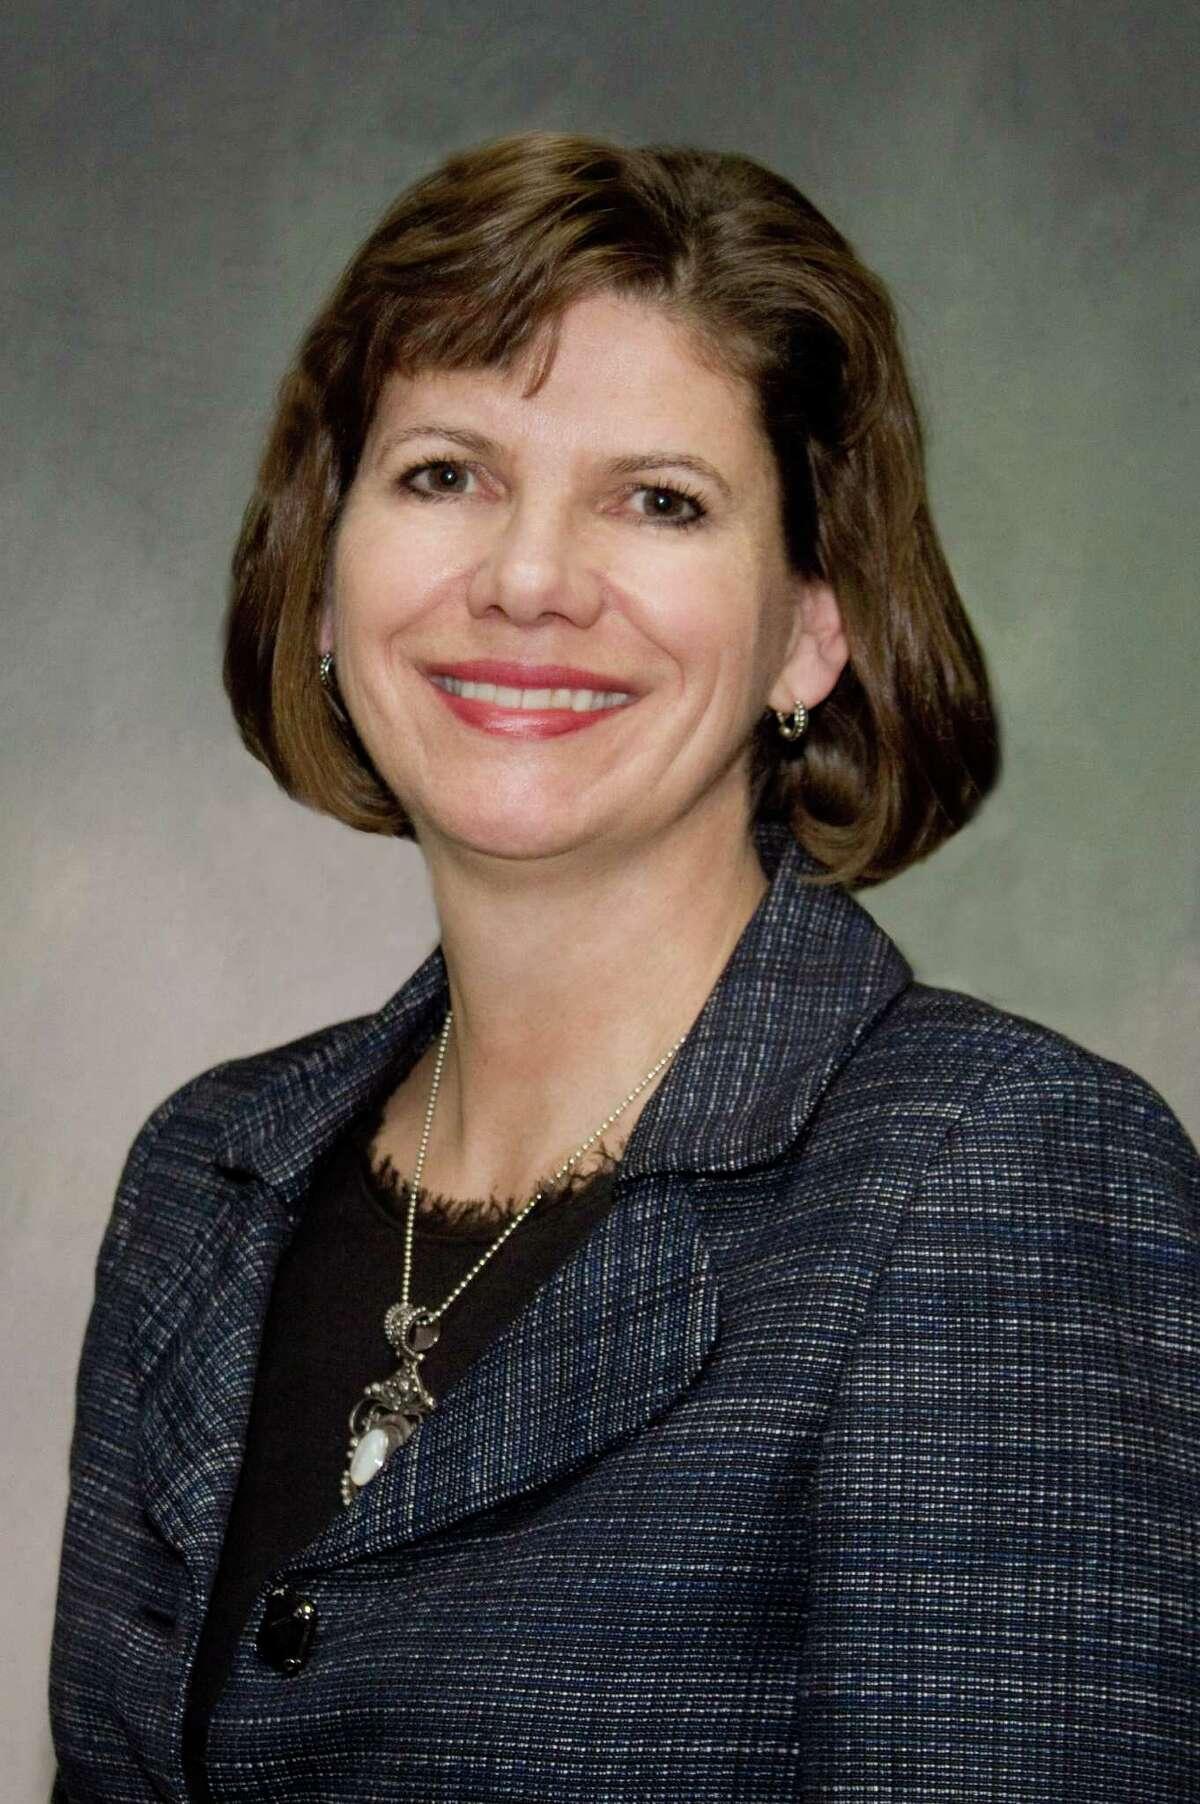 Gabriele Niederauer is CEO and president of Bluegrass Vascular Technologies Inc.